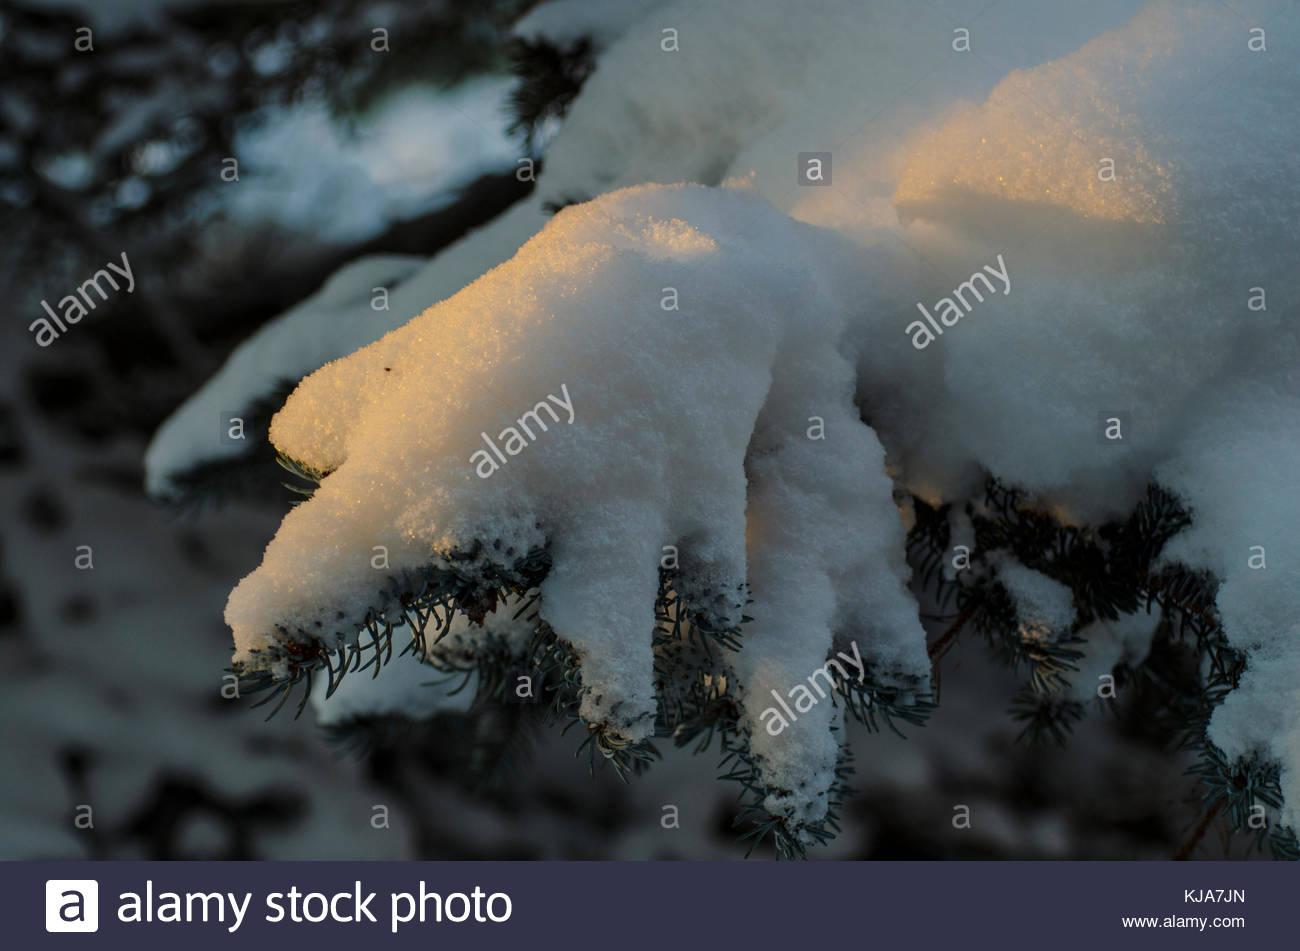 Last rays of sun on the crisp snow on the fir branch. - Stock Image